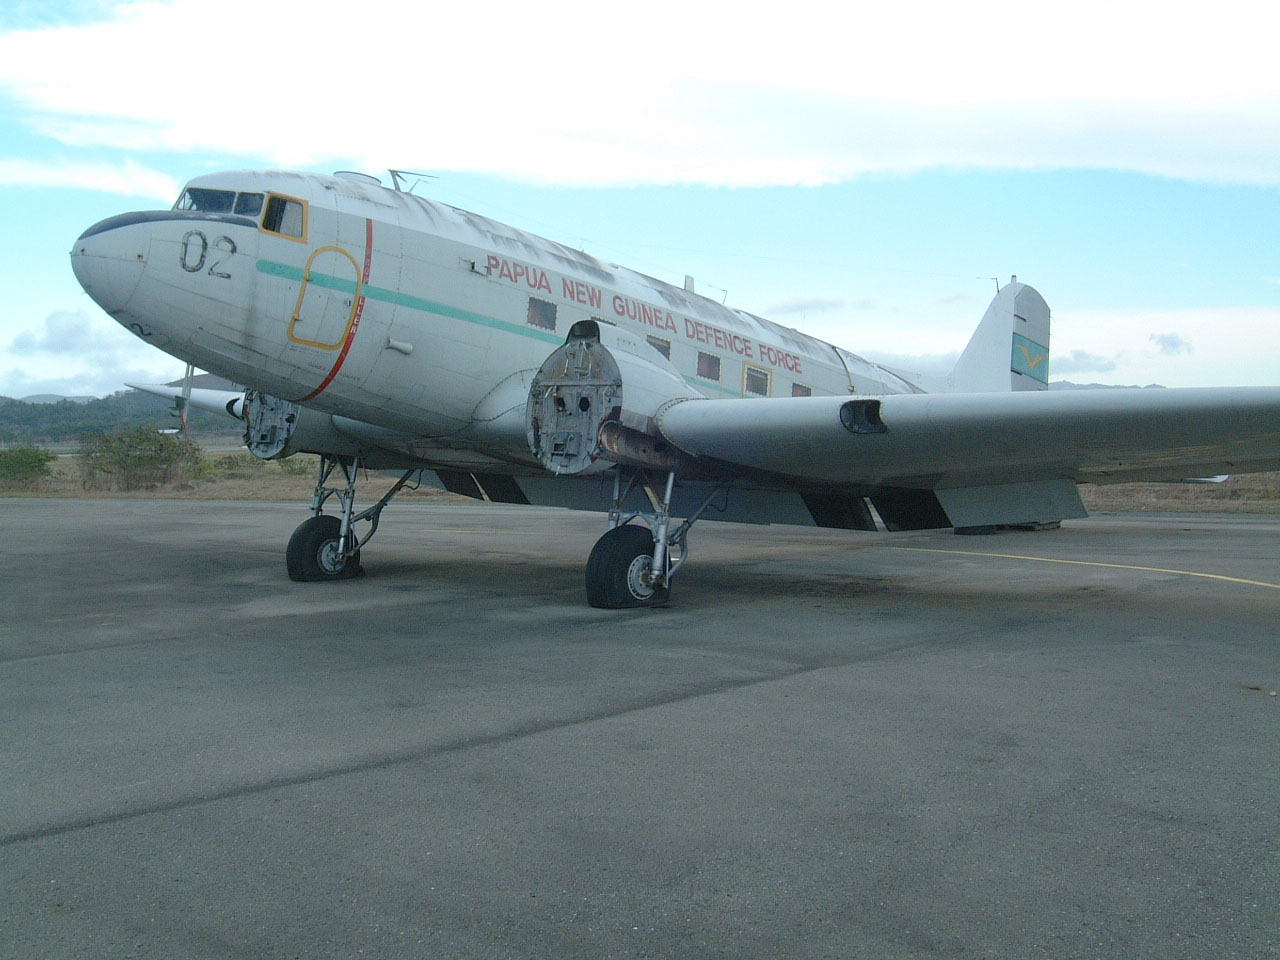 PNGDF C 47 P2 002 ex USAAF 44 76545 Derelict Jacksons Airport Sep 2002 02